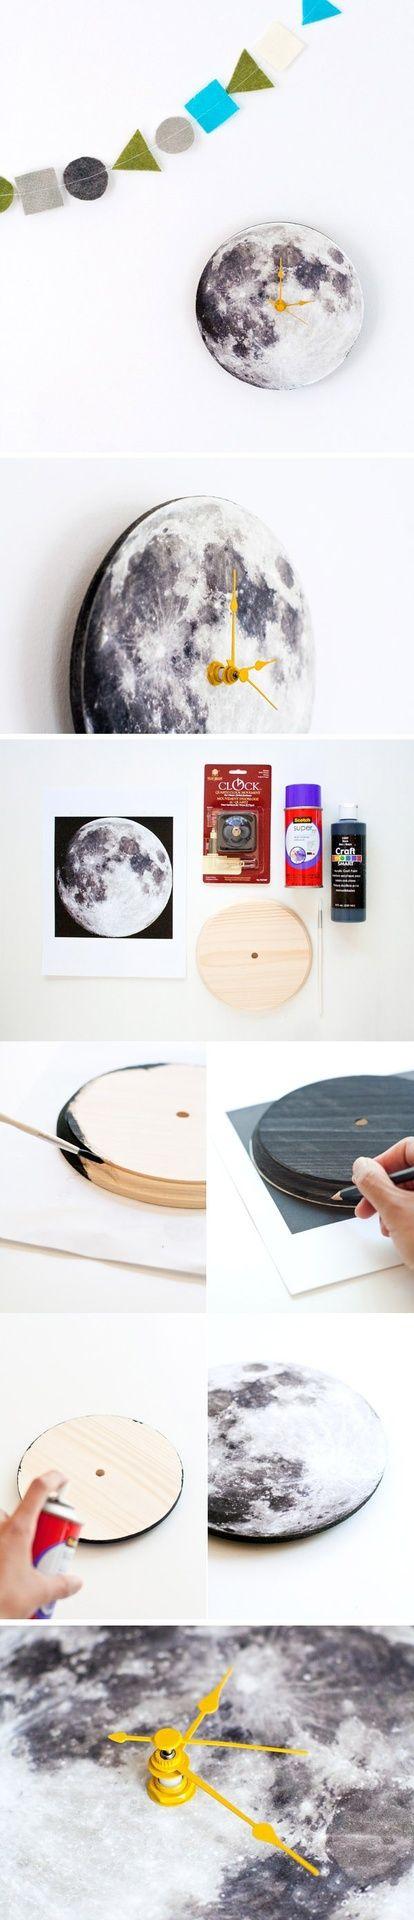 Living room decor ideas Moon clock - DIY